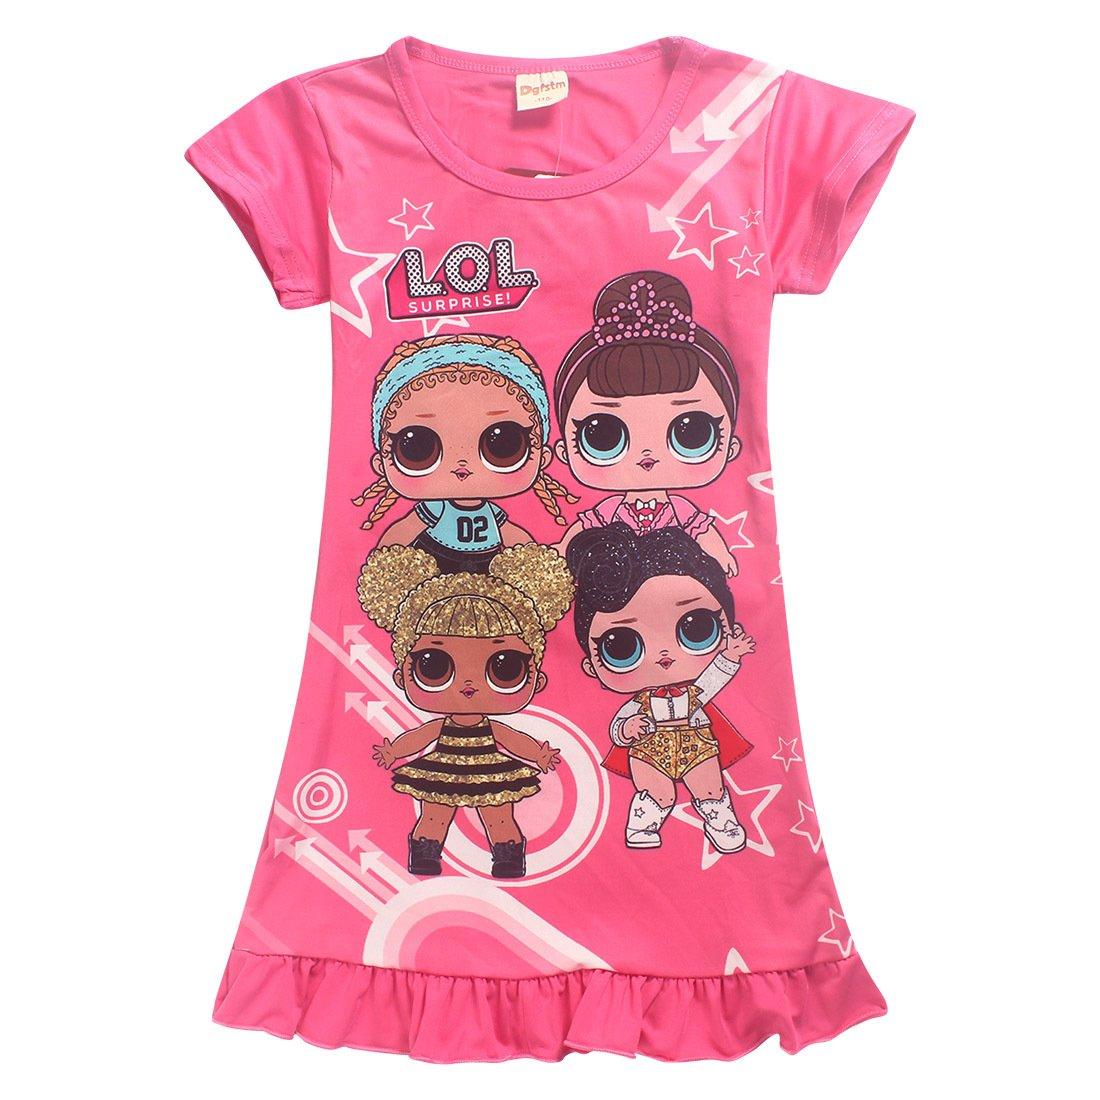 DGFSTM Comfy Loose Fit Pajamas Girls Printed Princess Dress Sleepwear Nightgown Short sleeve